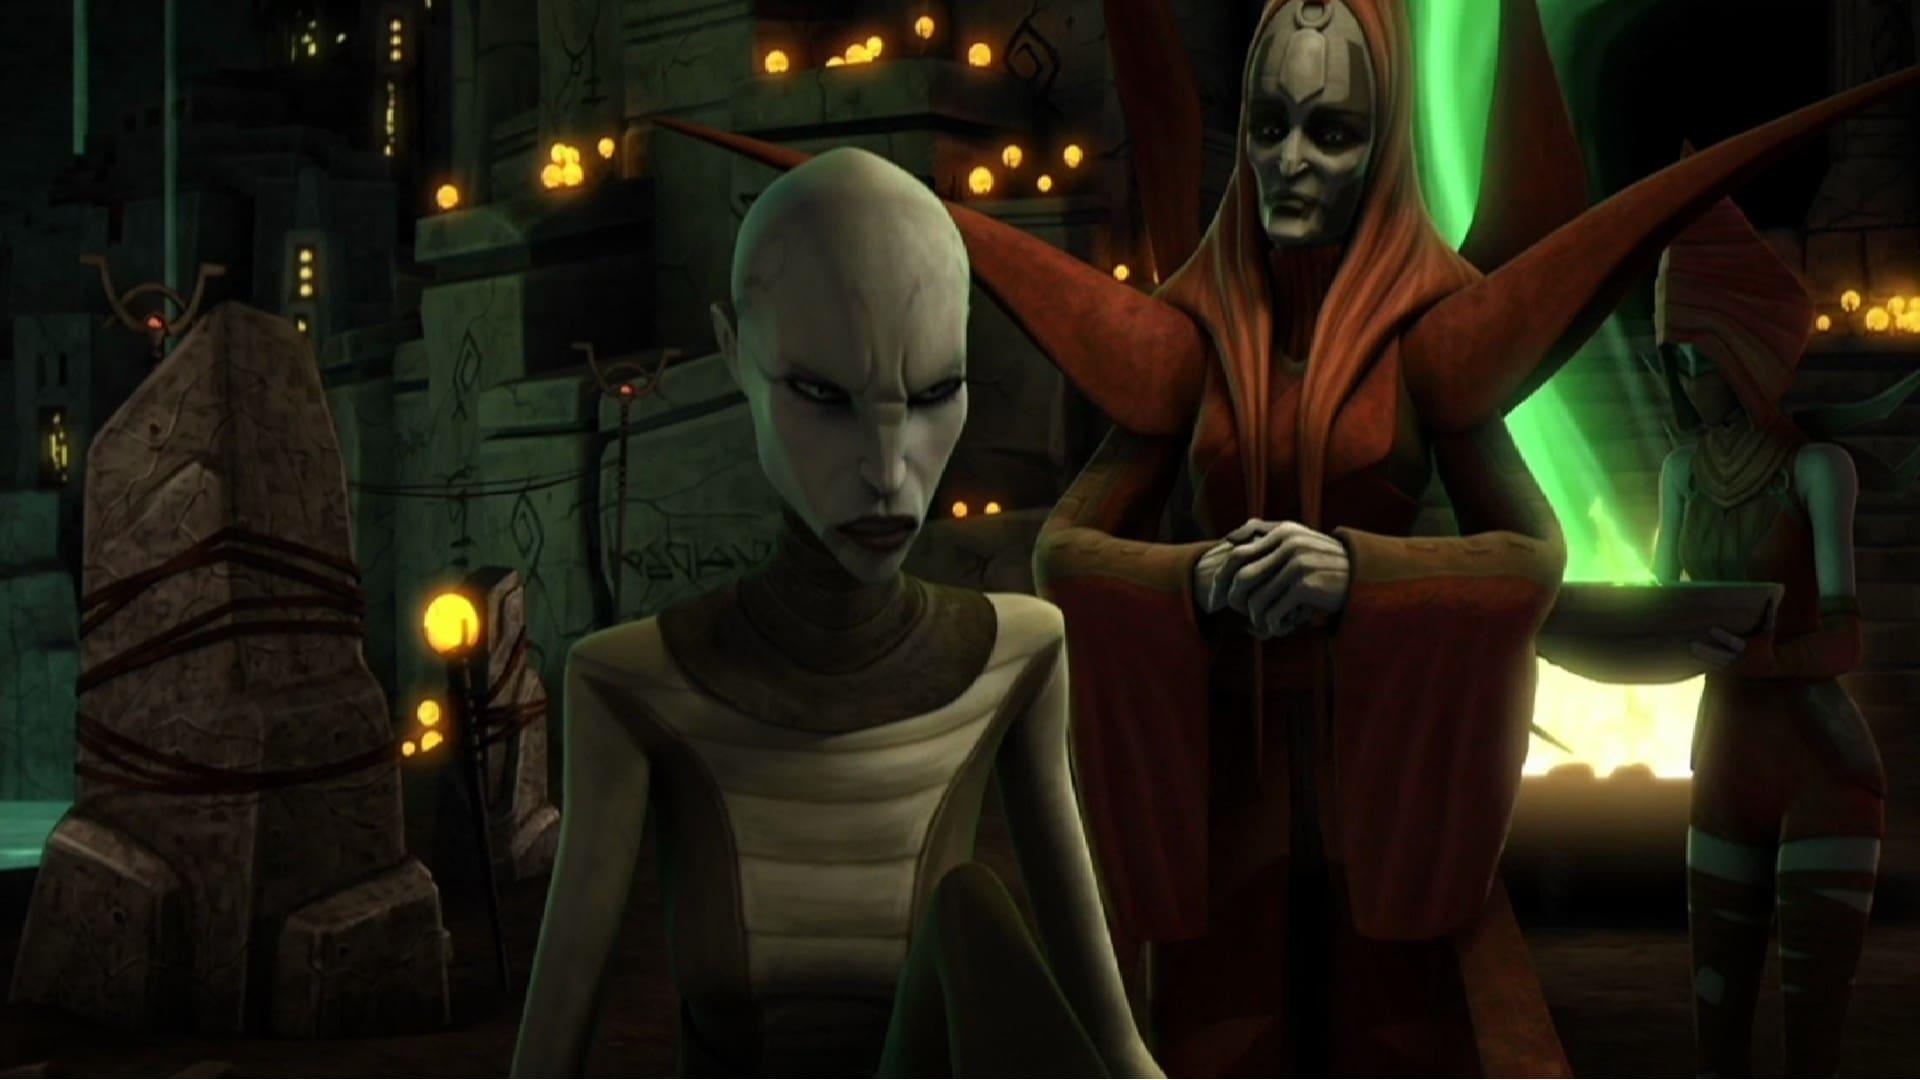 Star Wars: The Clone Wars - Season 3 Episode 12 : Nightsisters